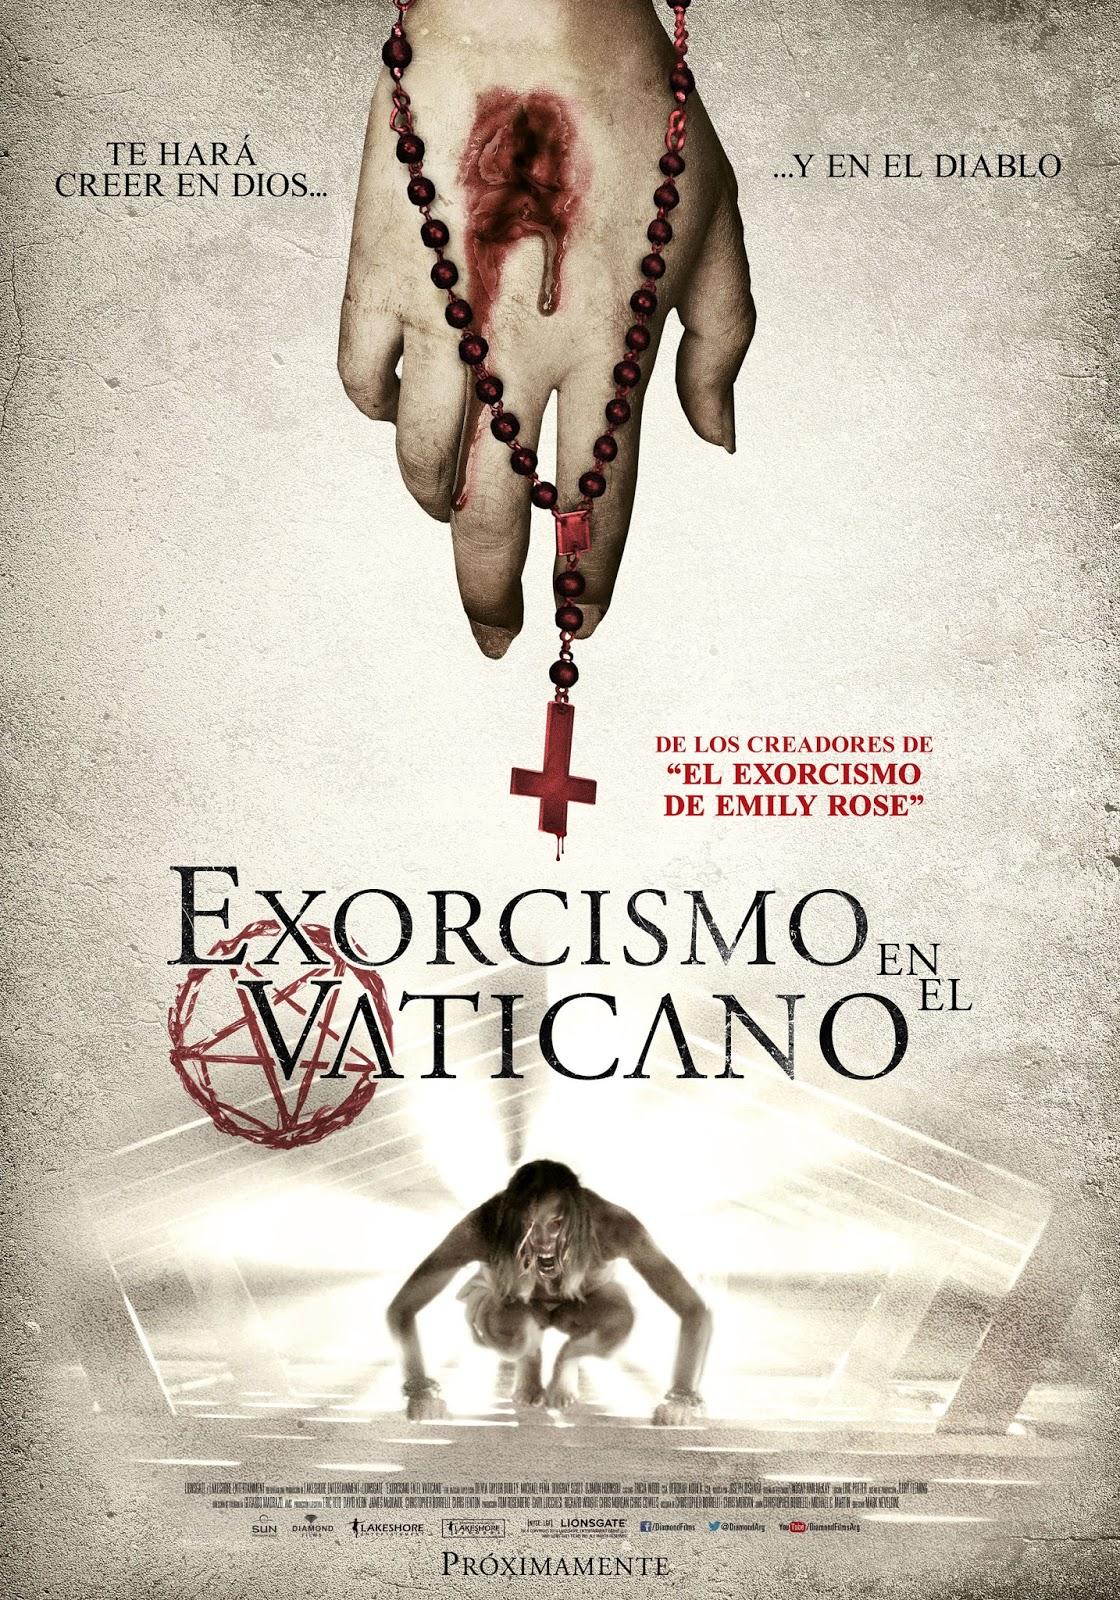 http://1.bp.blogspot.com/-klUcLpHGACQ/VXXMhvoMNgI/AAAAAAAAfJo/T0tzftLcgxA/s1600/Exorcismo_En_El_Vaticano_Poster_Latino_JPosters.jpg